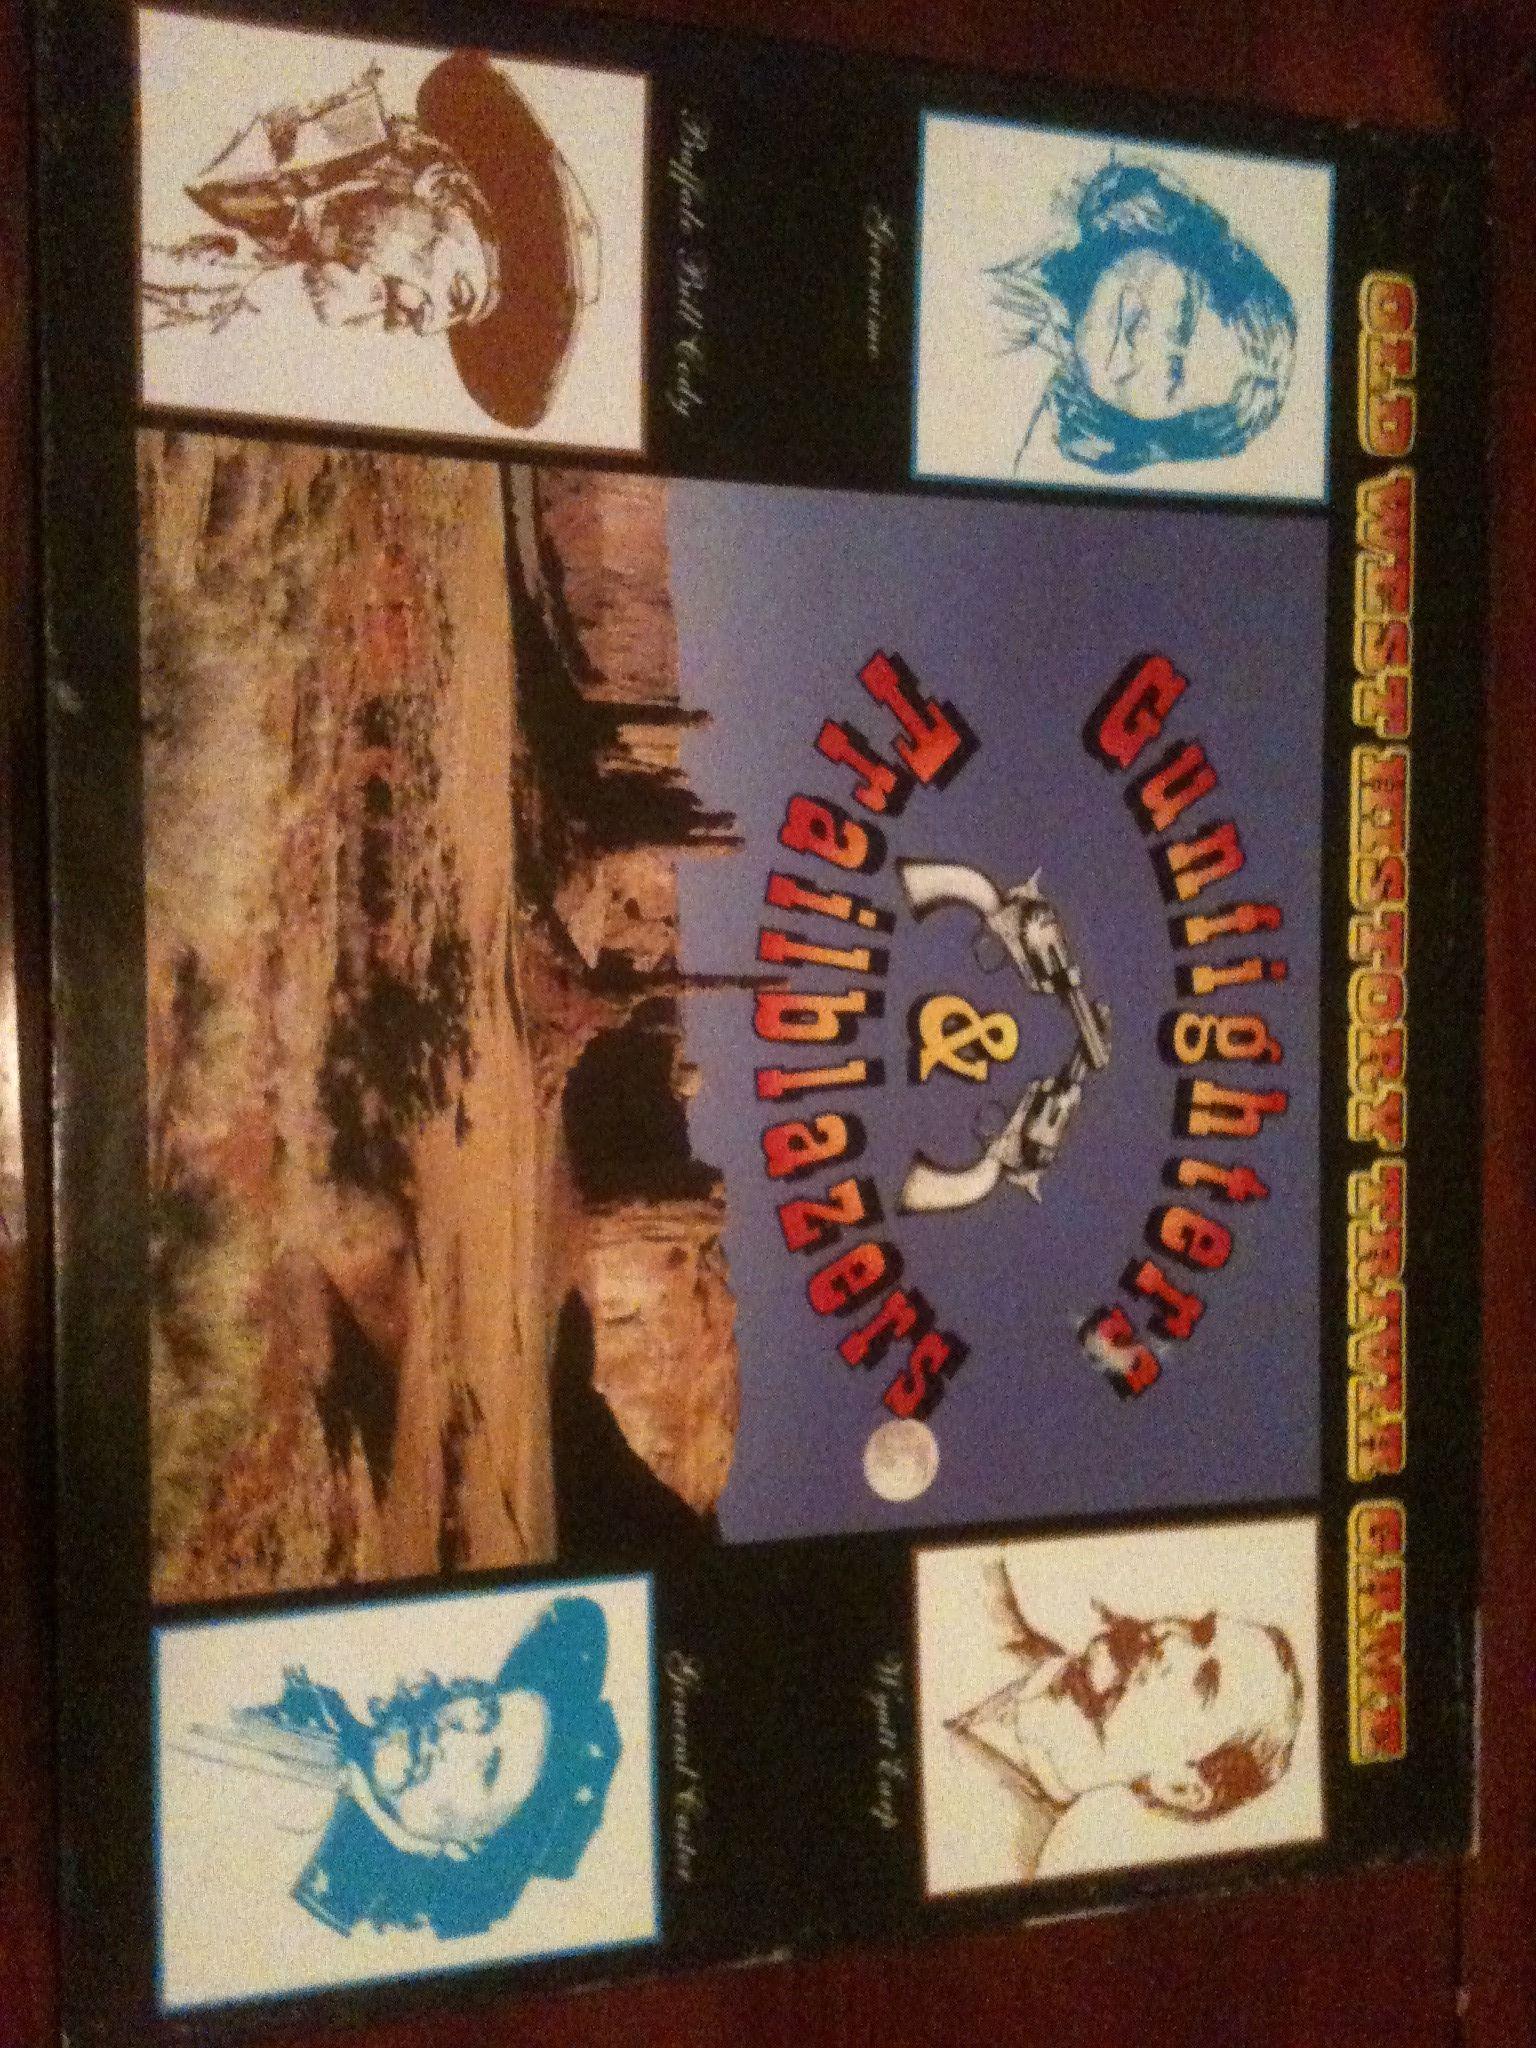 Gunfighters trailblazers american west custer